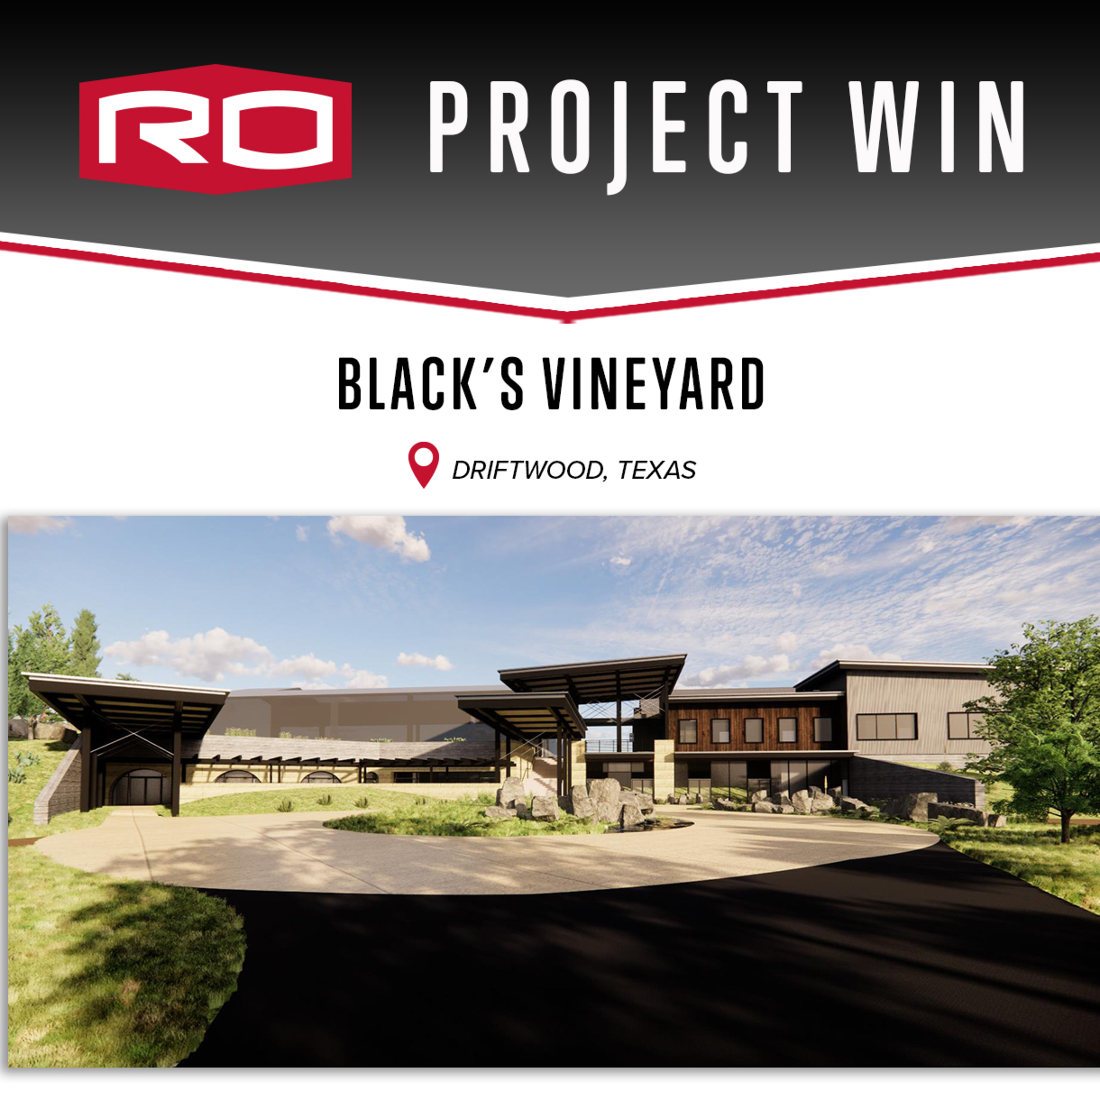 PROJECT WIN: BLACK'S VINEYARD